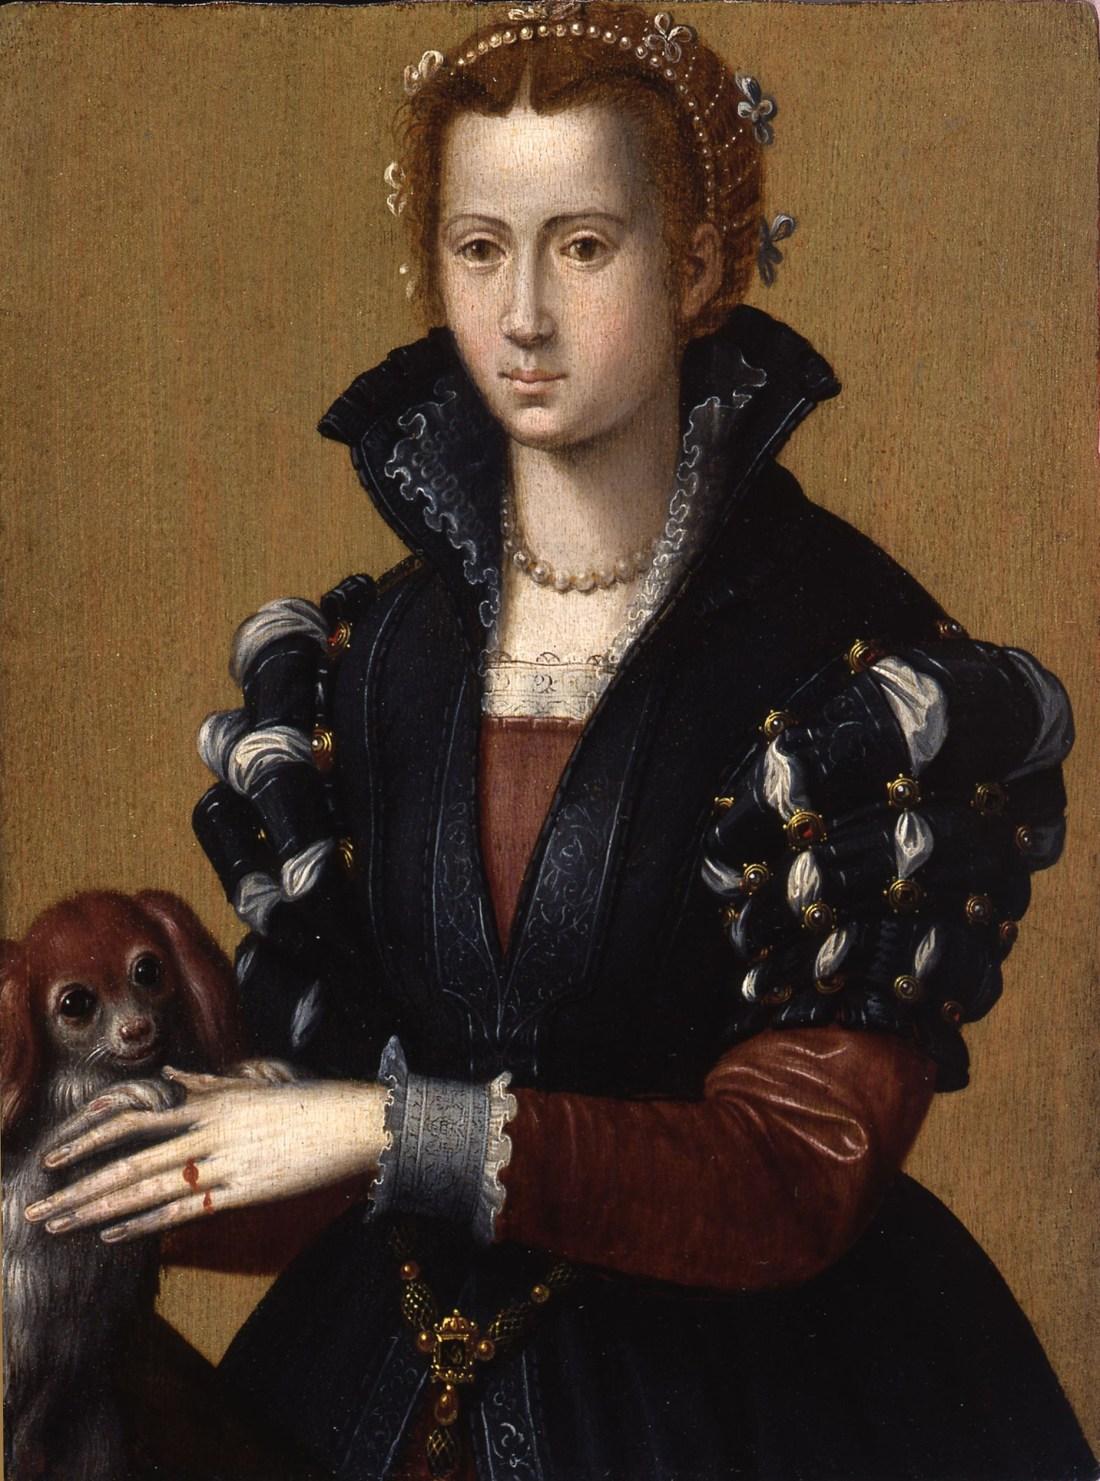 Portrait of Eleonora of Toledo (1522-1562), wife of Cosimo de Medici I, the first Duke of Florence. ca. 1570's.